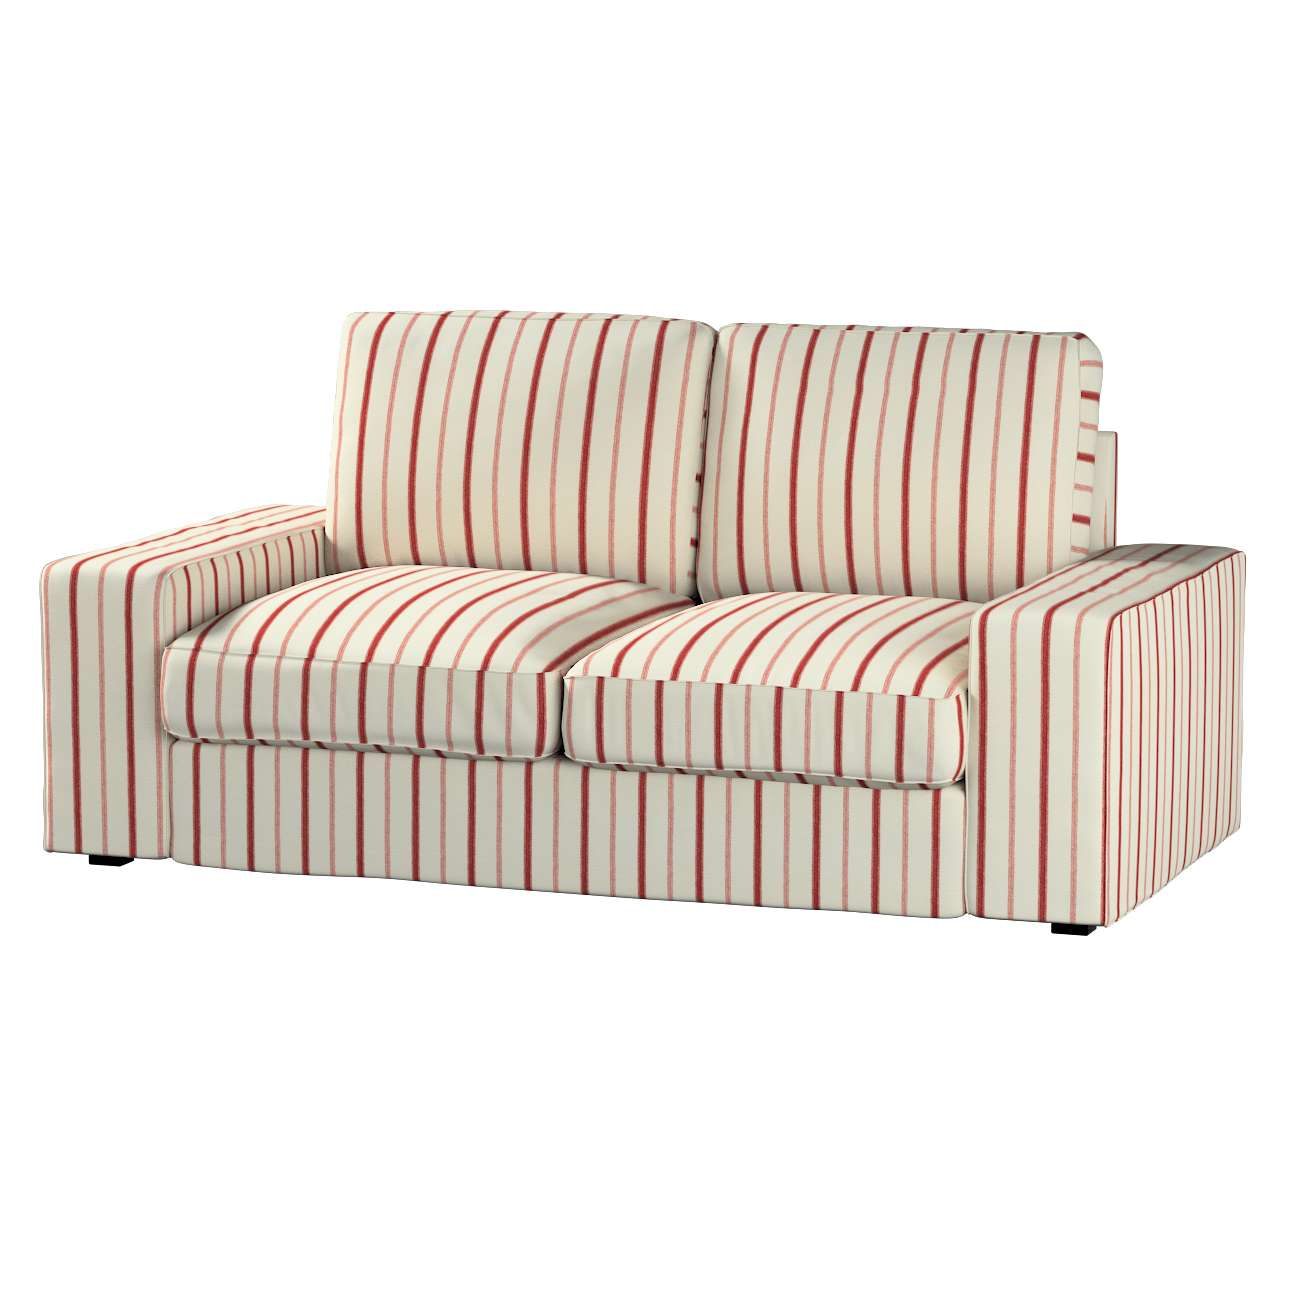 Kivik 2-seater sofa cover in collection Avinon, fabric: 129-15